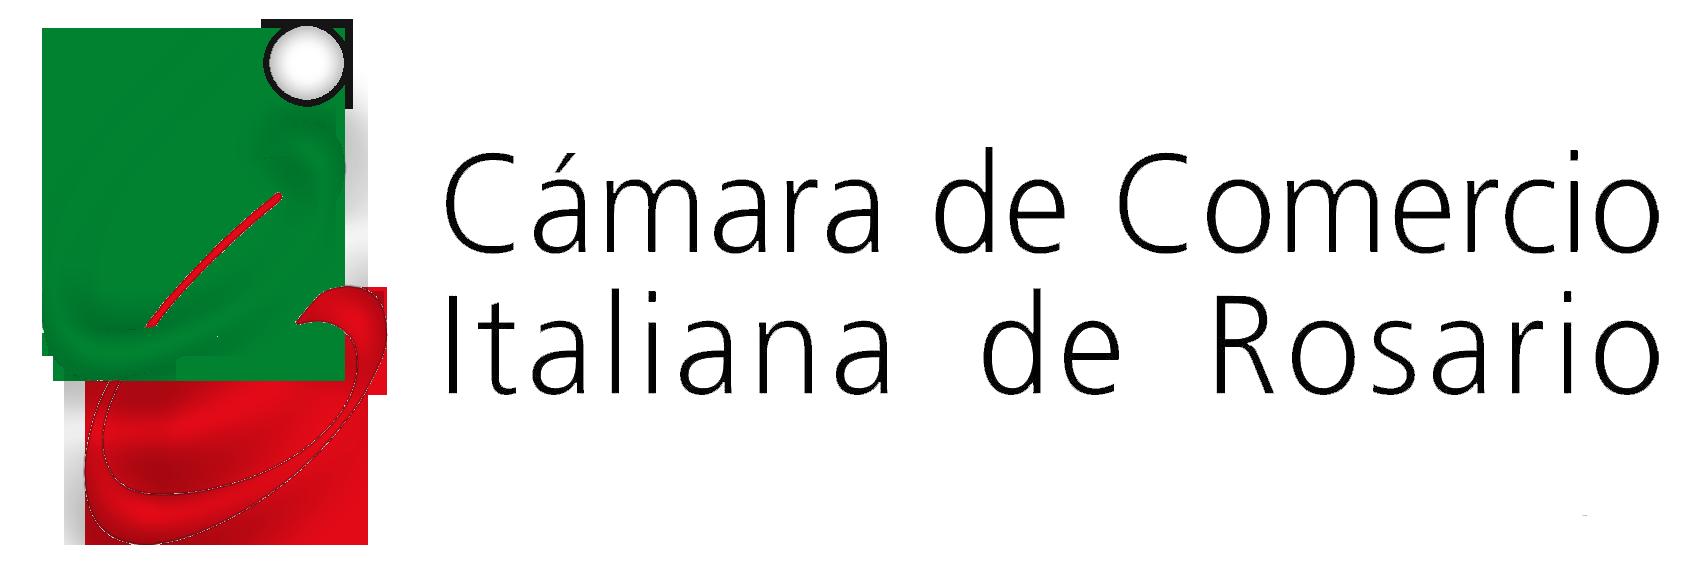 Cámara de Comercio Italiana de Rosario (CCIR)